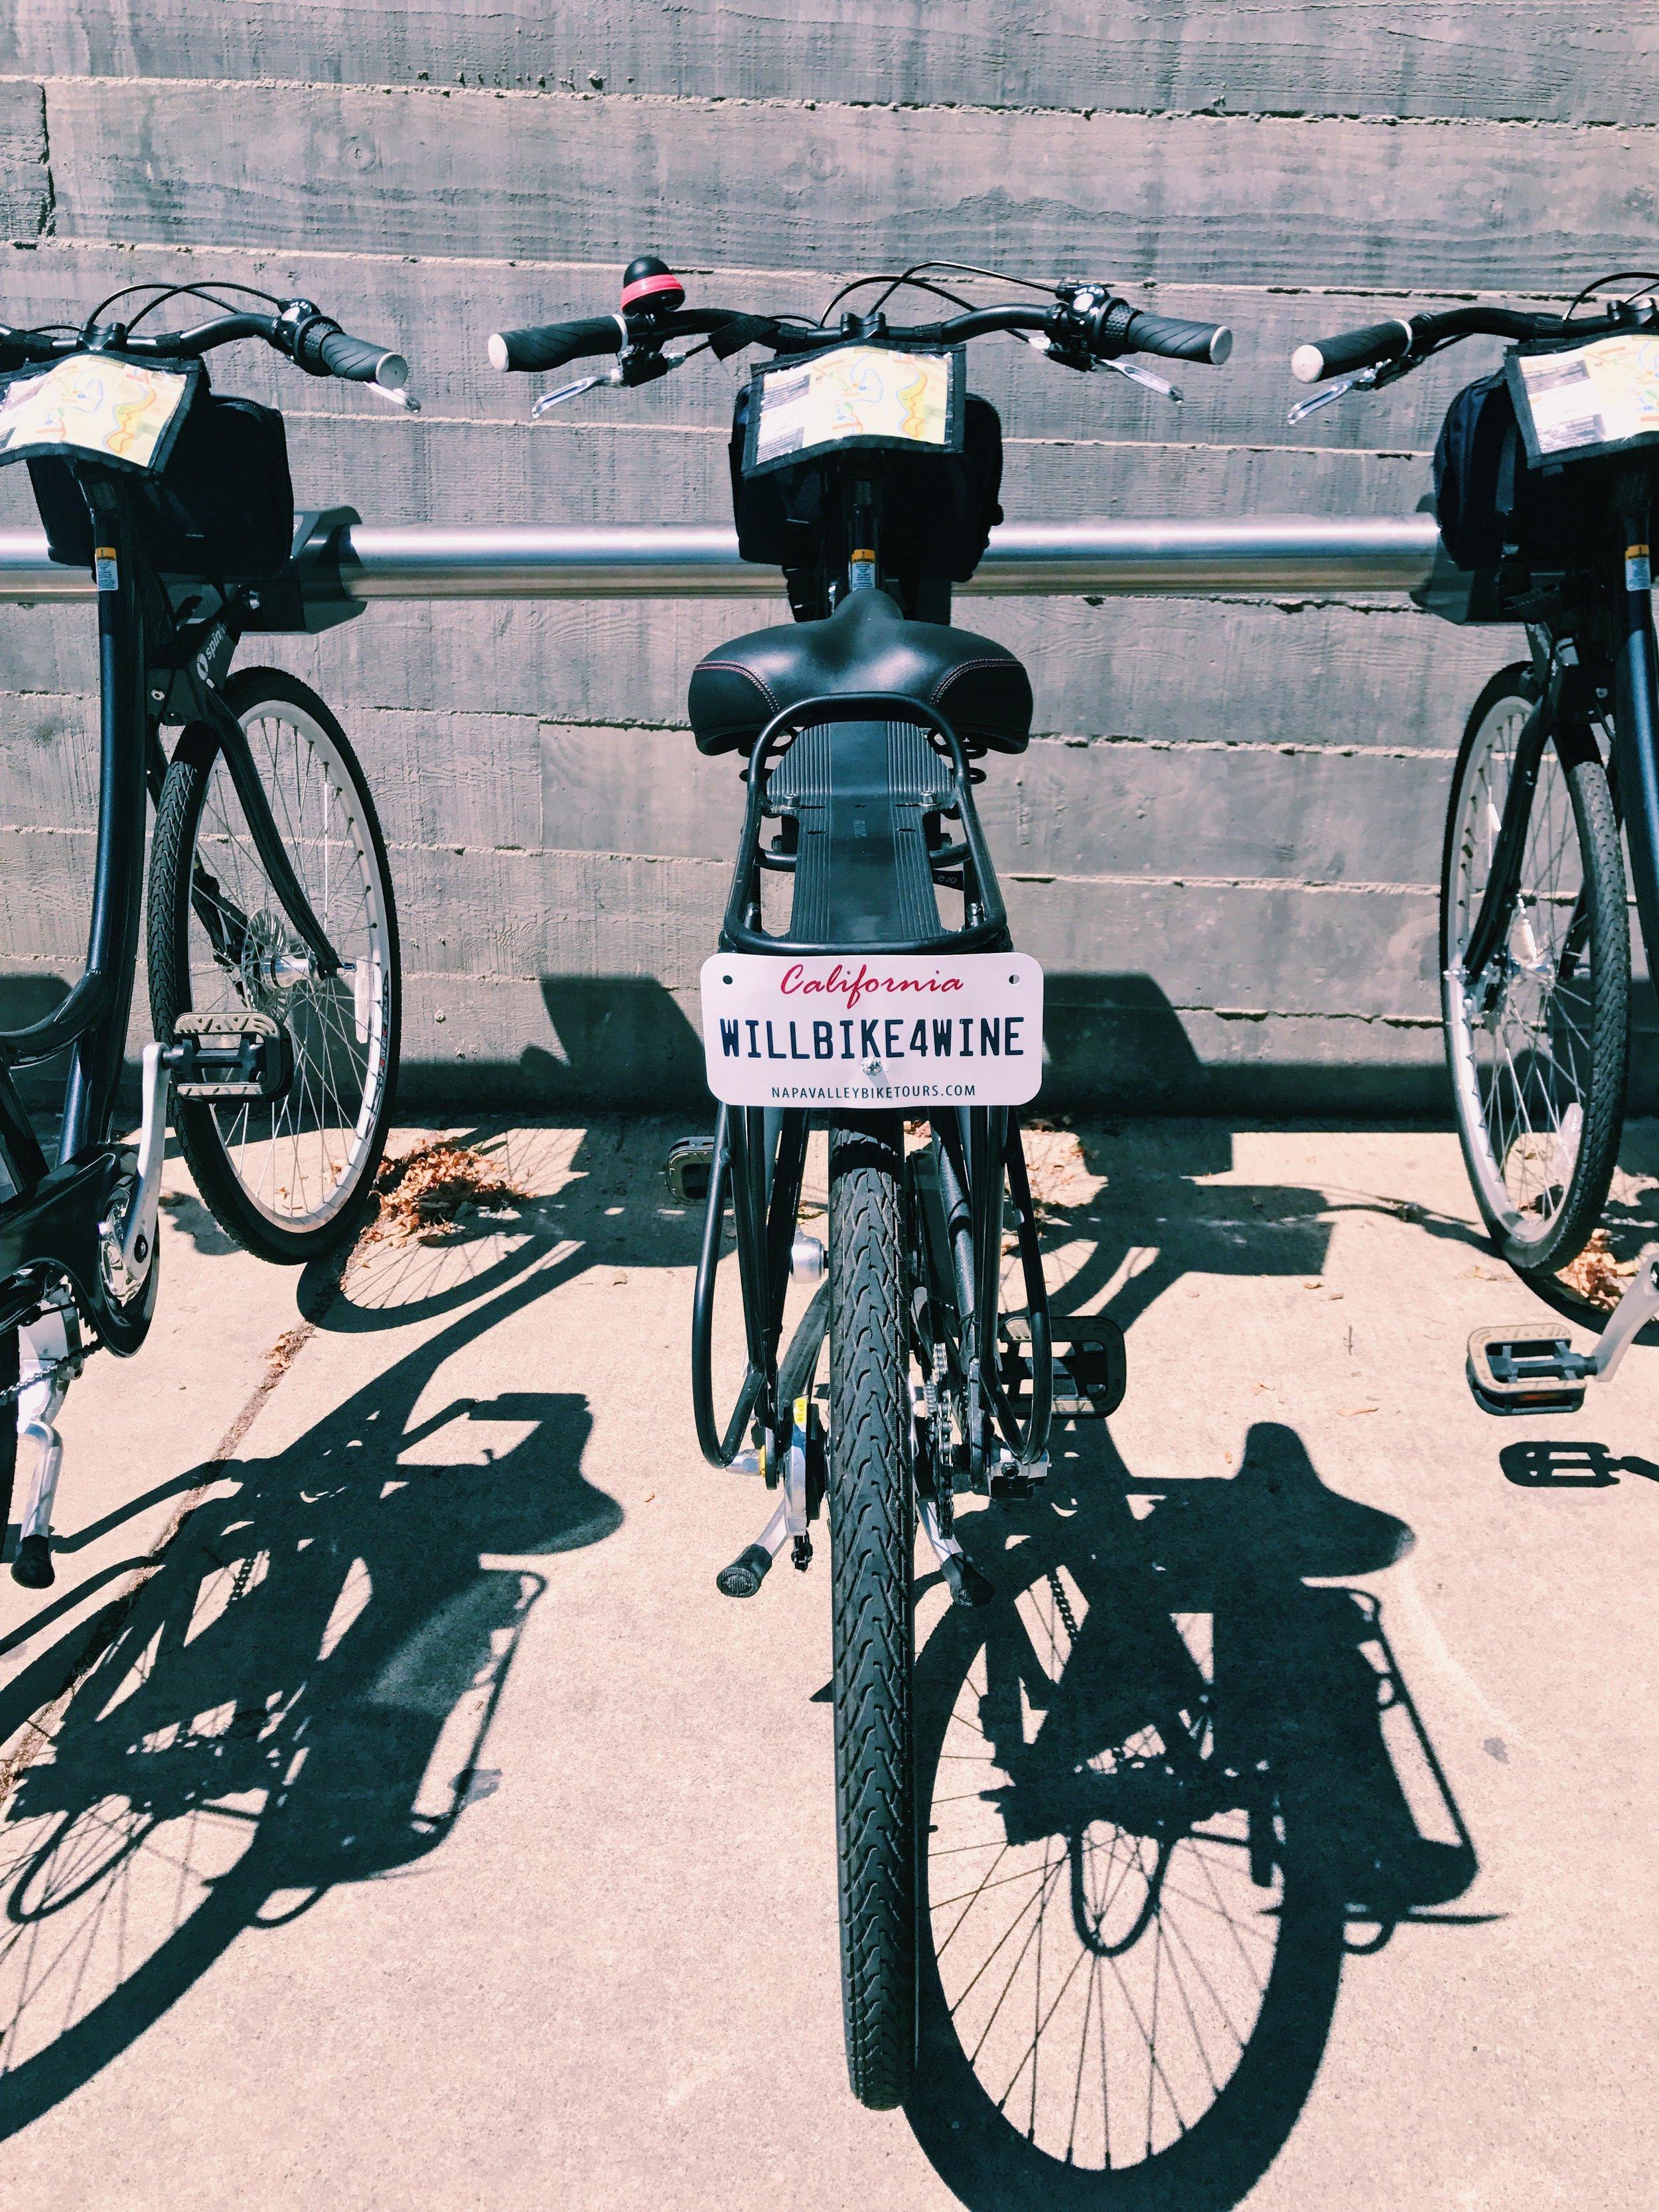 will bike for wine